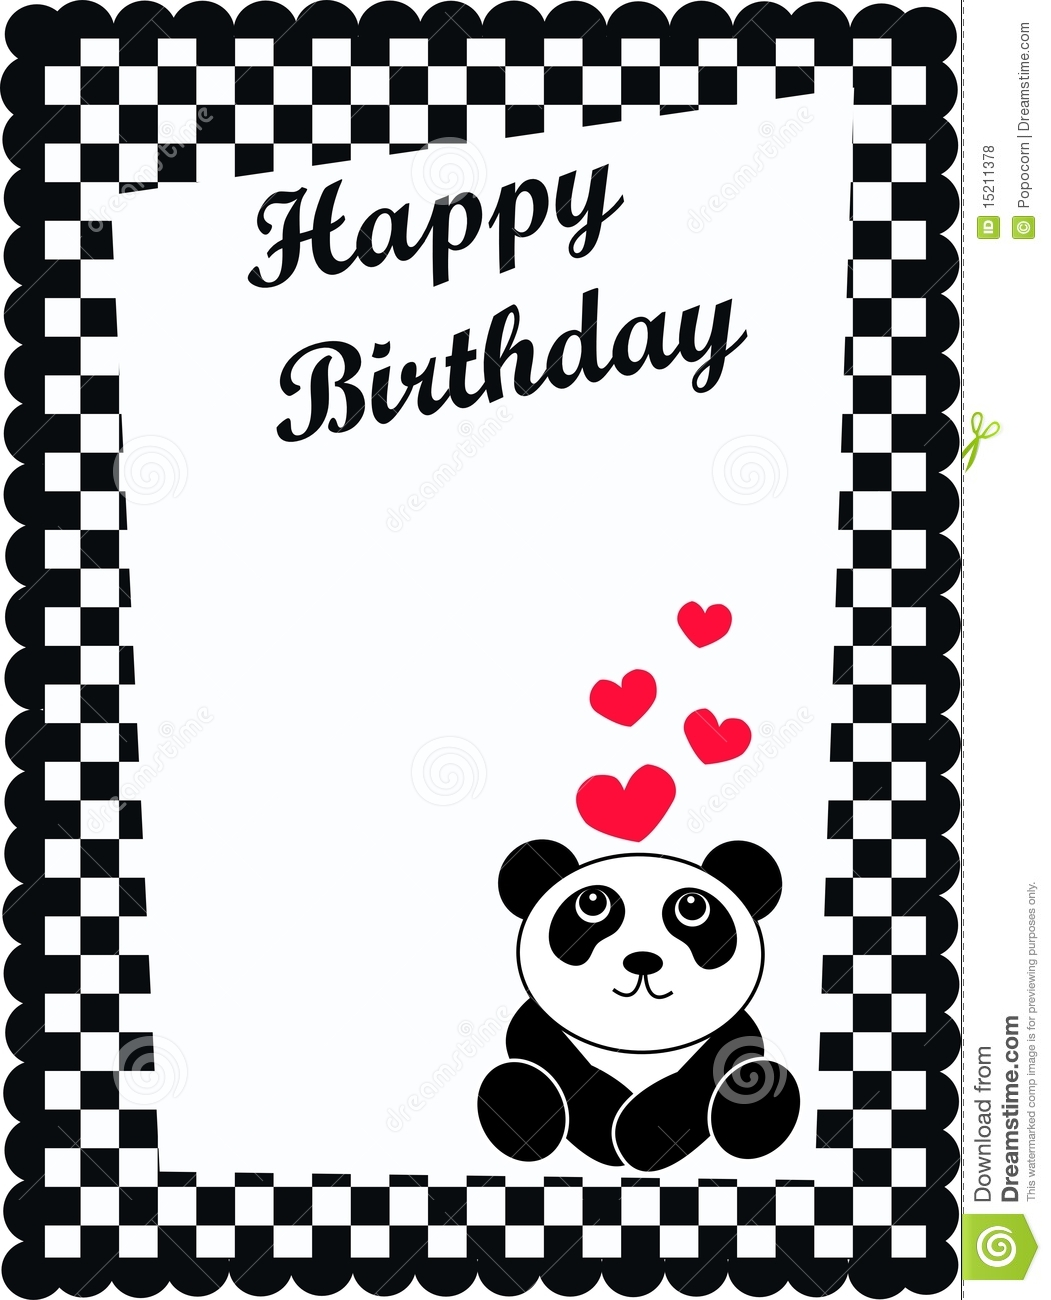 BlackStriped Birthday Cards Crafthubs – Black and White Birthday Card